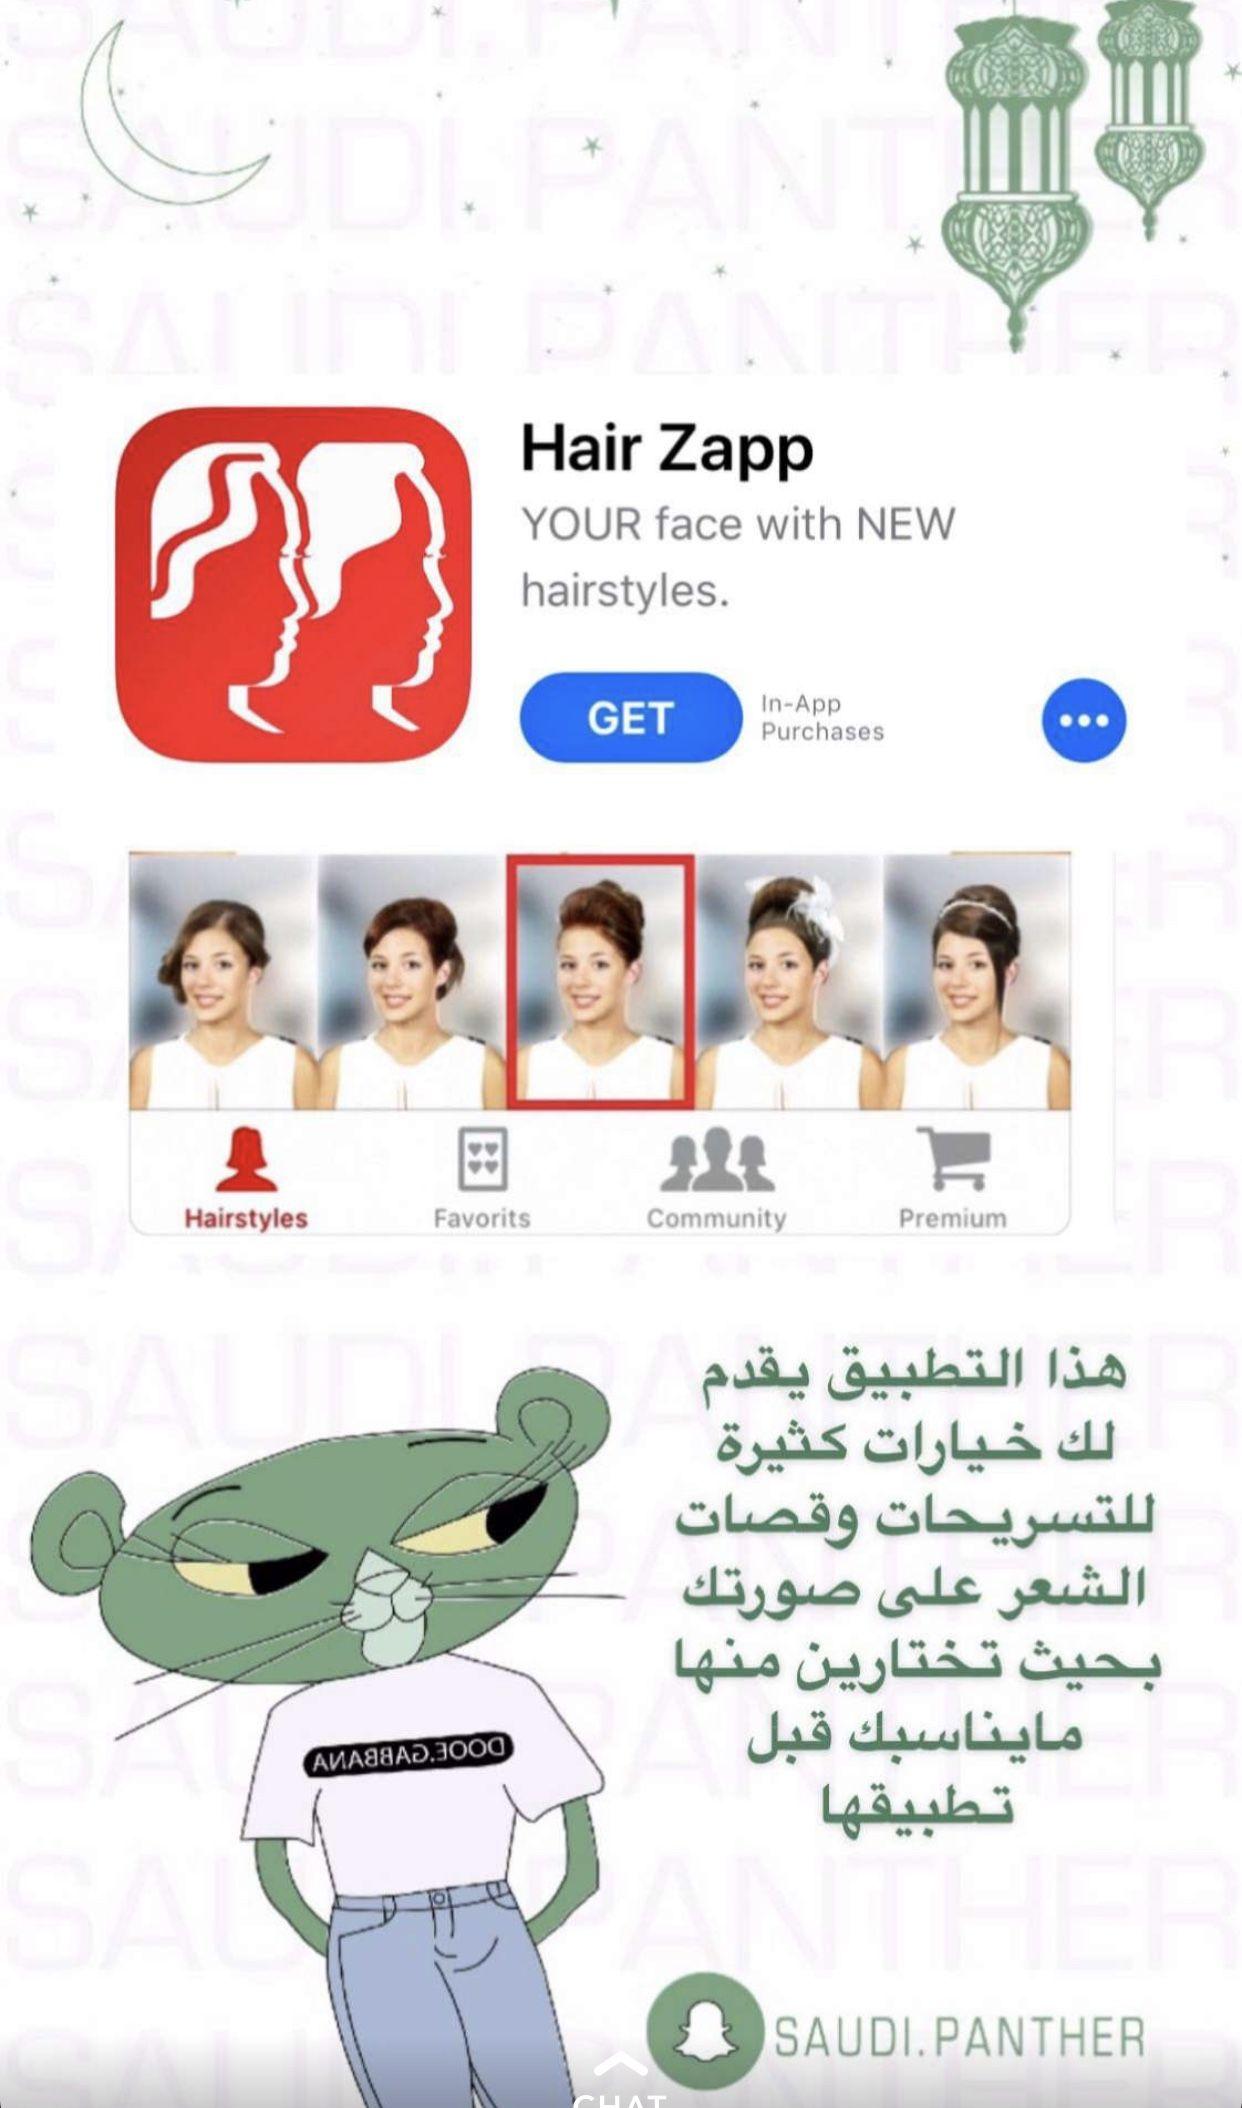 Idea by Re0o0iry on Makeupمكياج Iphone photo editor app